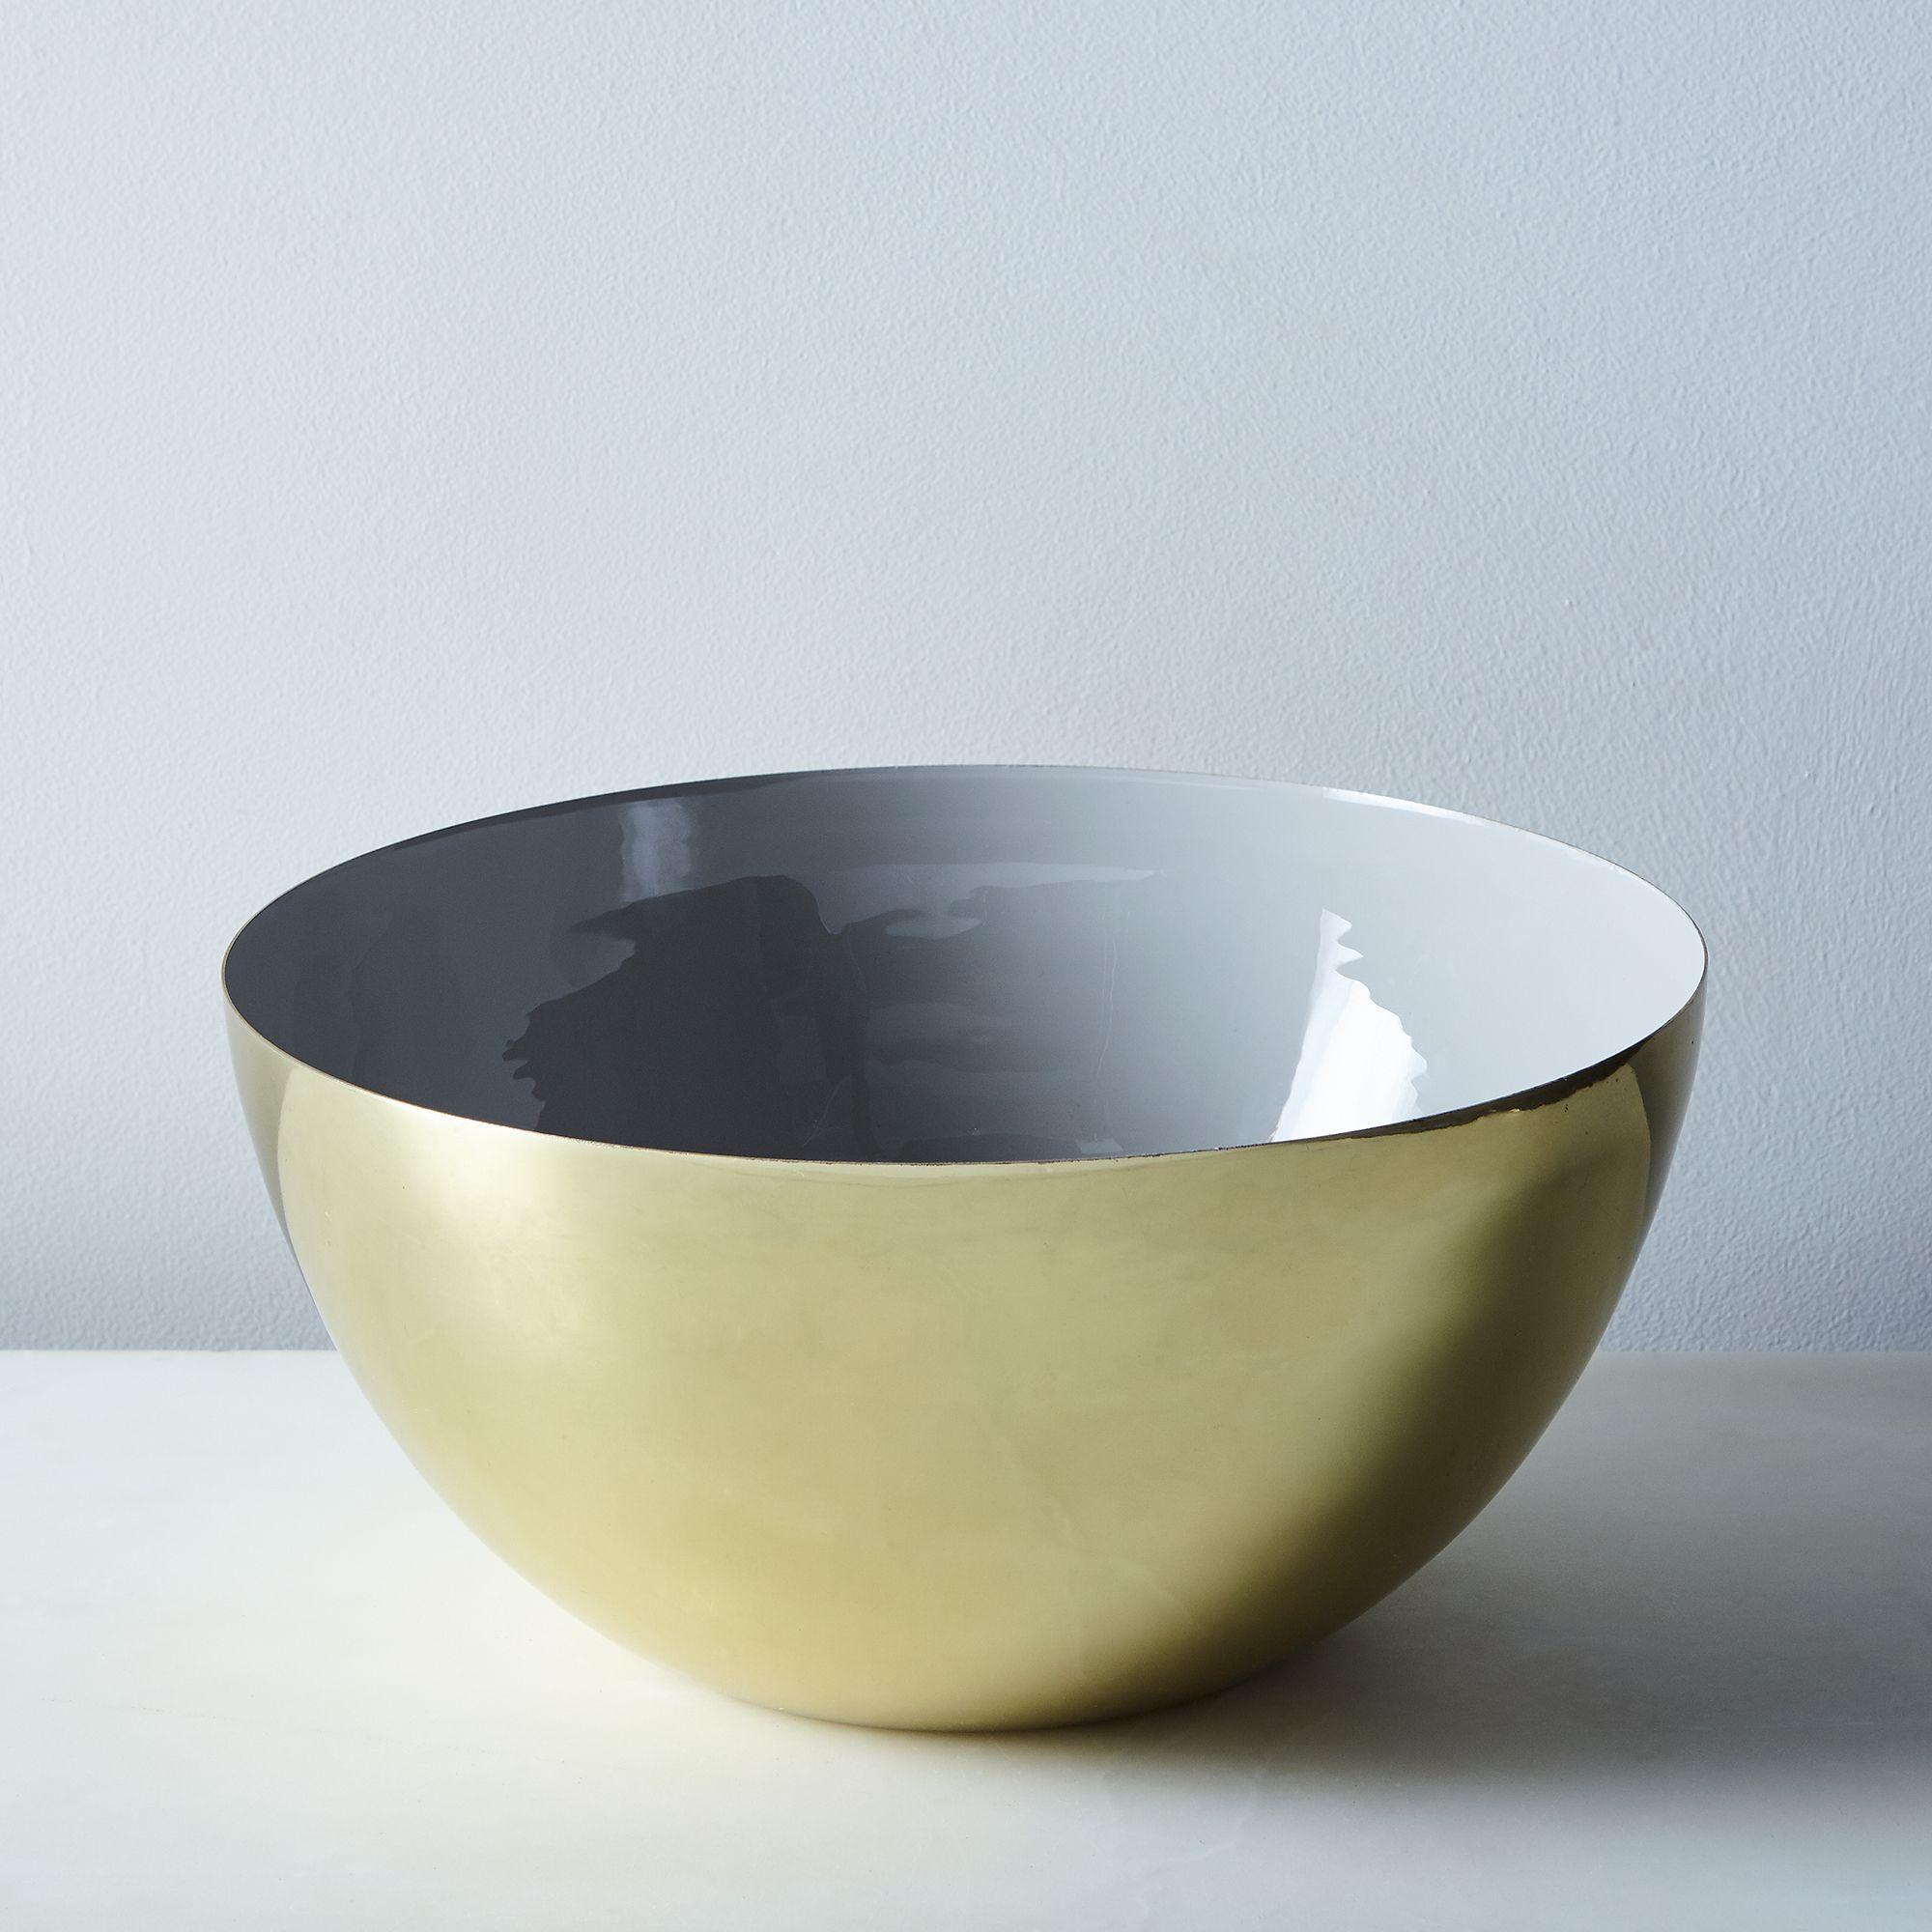 Da80ce0e 853a 4464 b3a6 81cccd762647  2016 1118 food52 hawkins ny grey enamel louise bowls brass large silo rocky luten 134 1